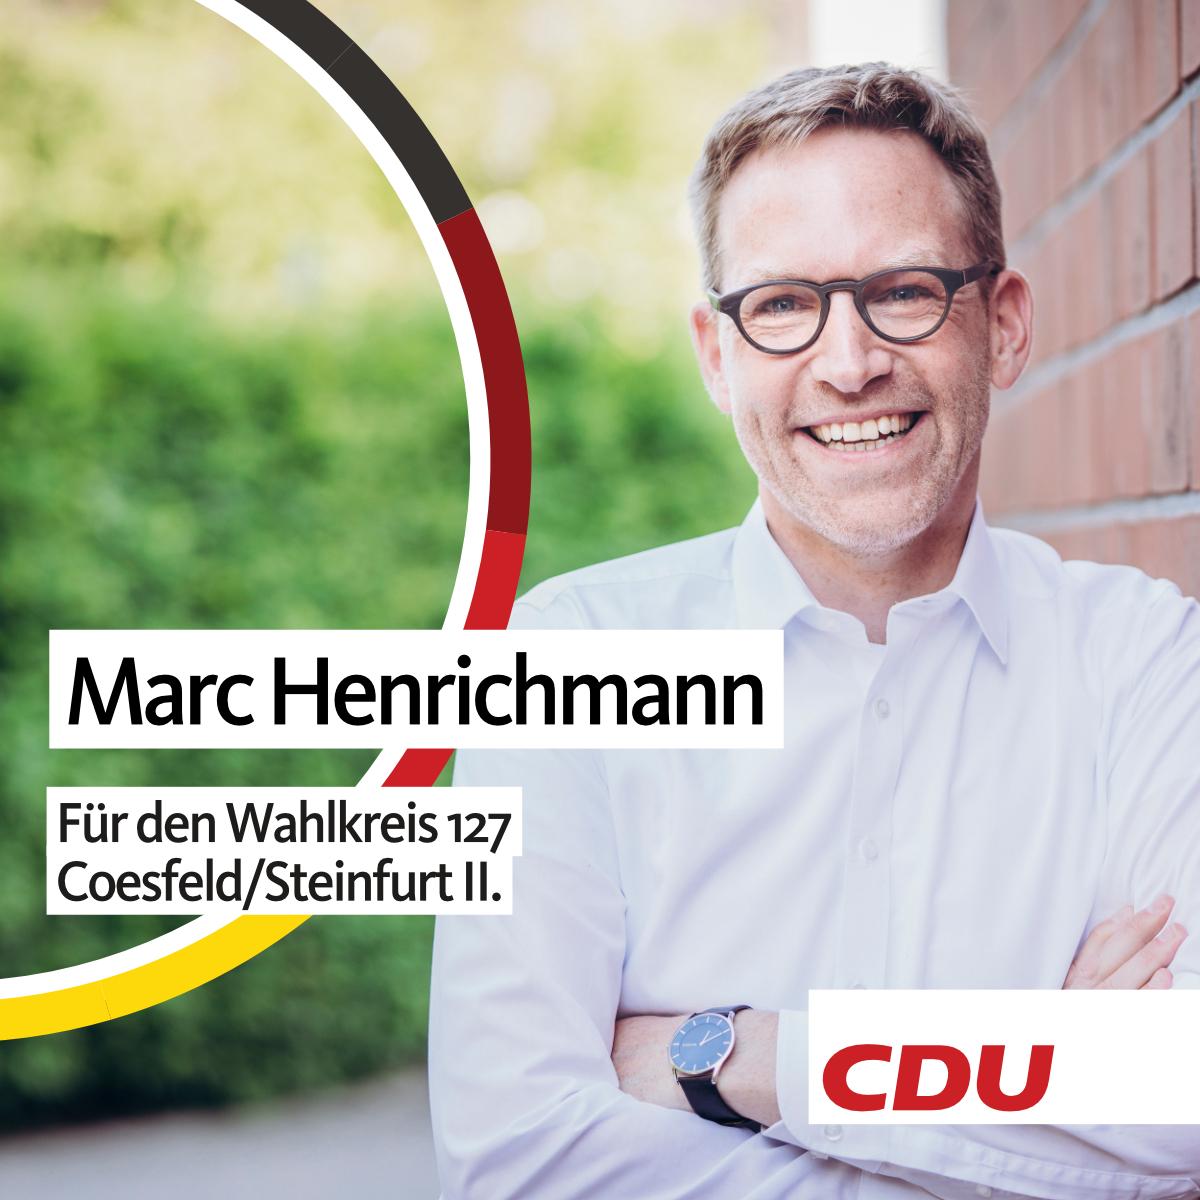 Marc Henrichmann